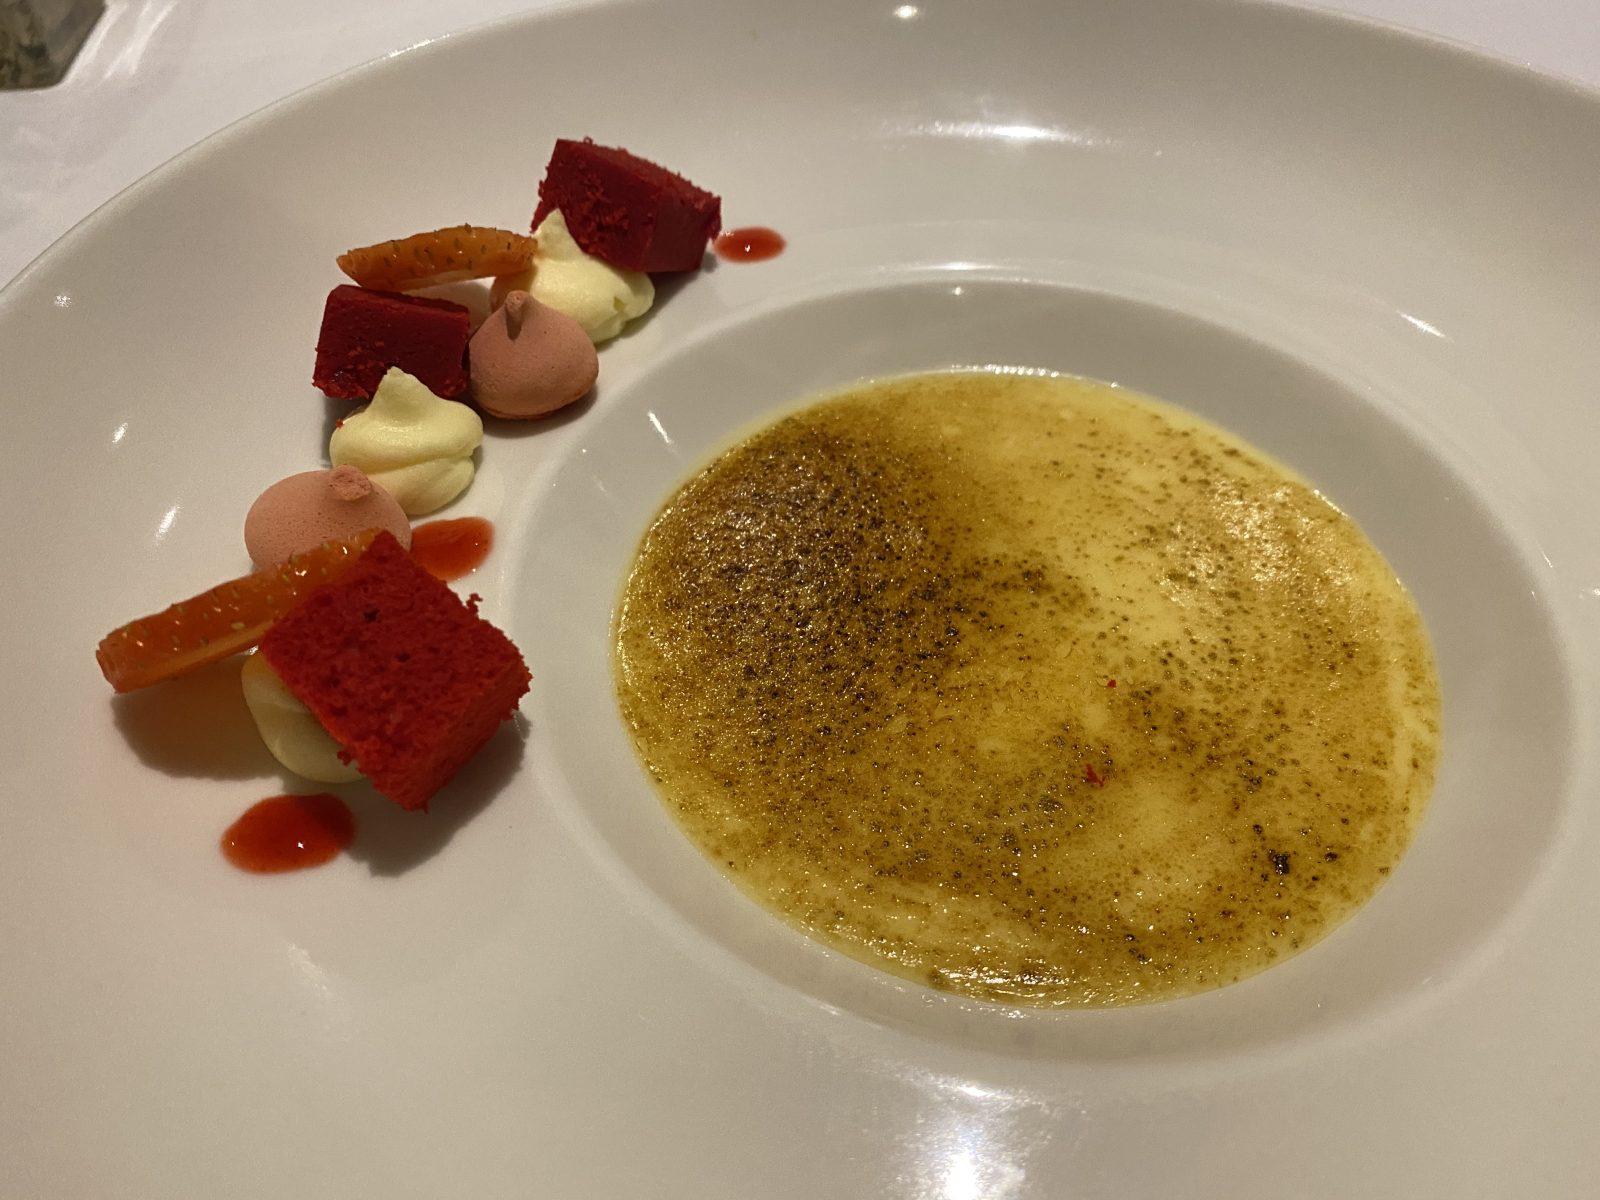 Dessert El Dorado casita